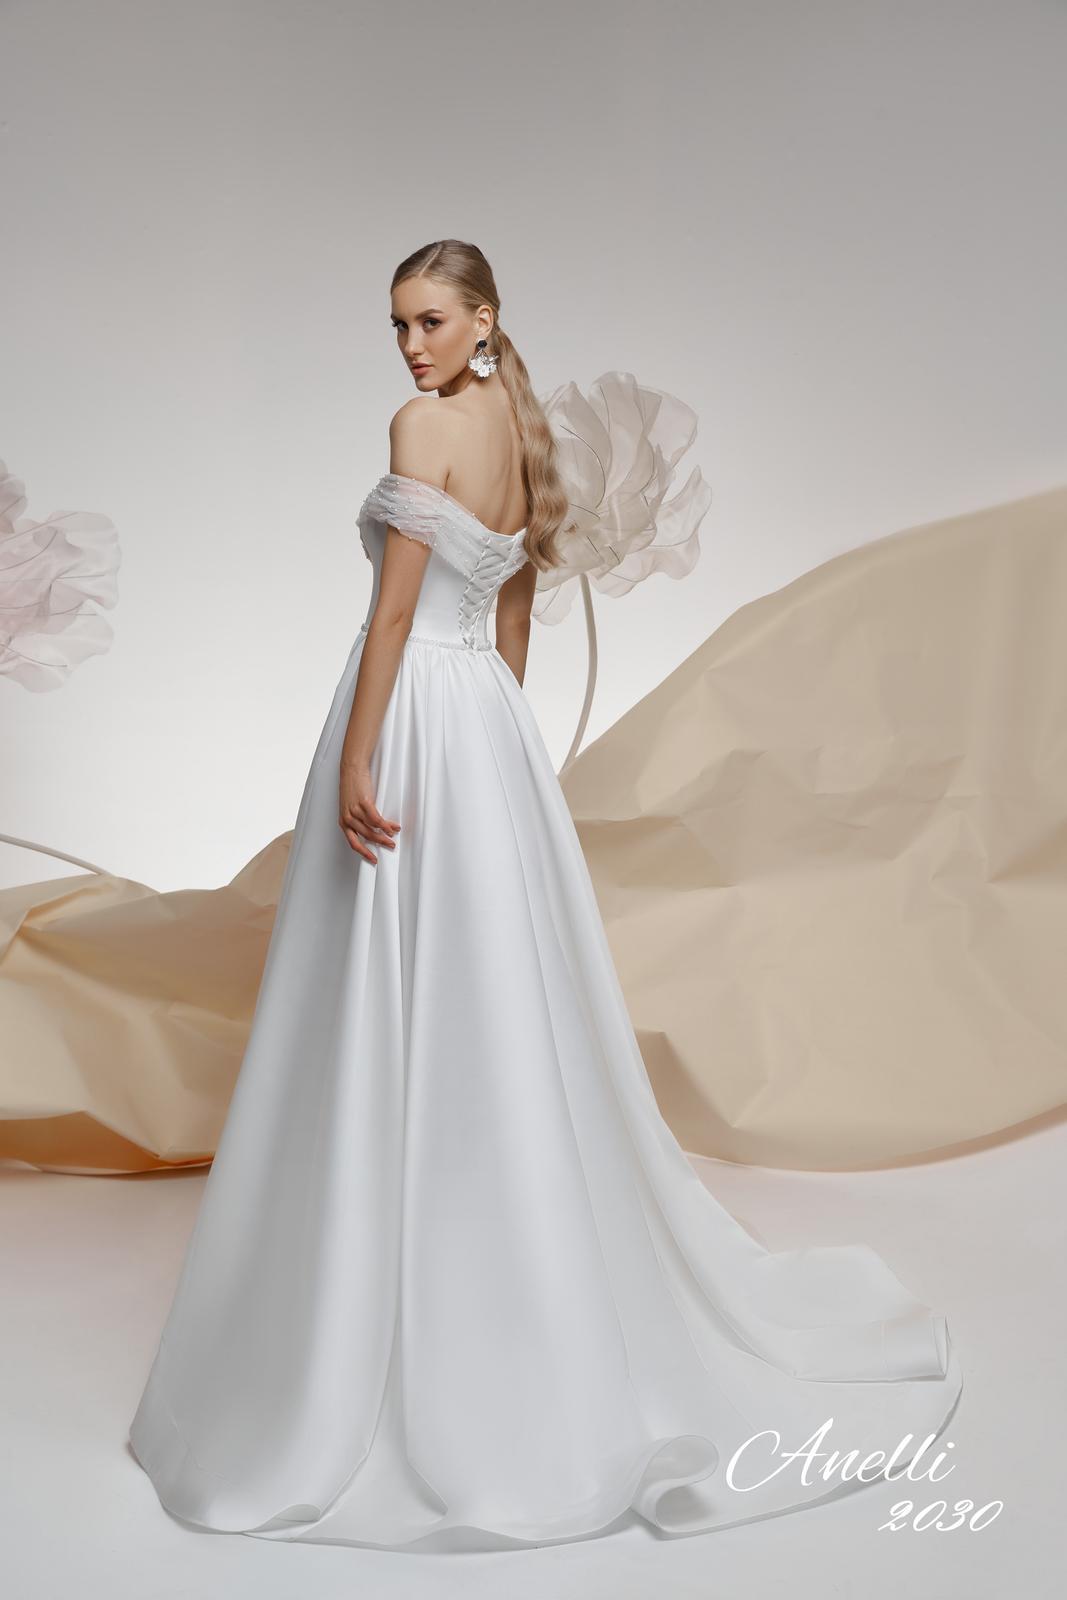 Svadobné šaty - Imagine 2030 - Obrázok č. 2